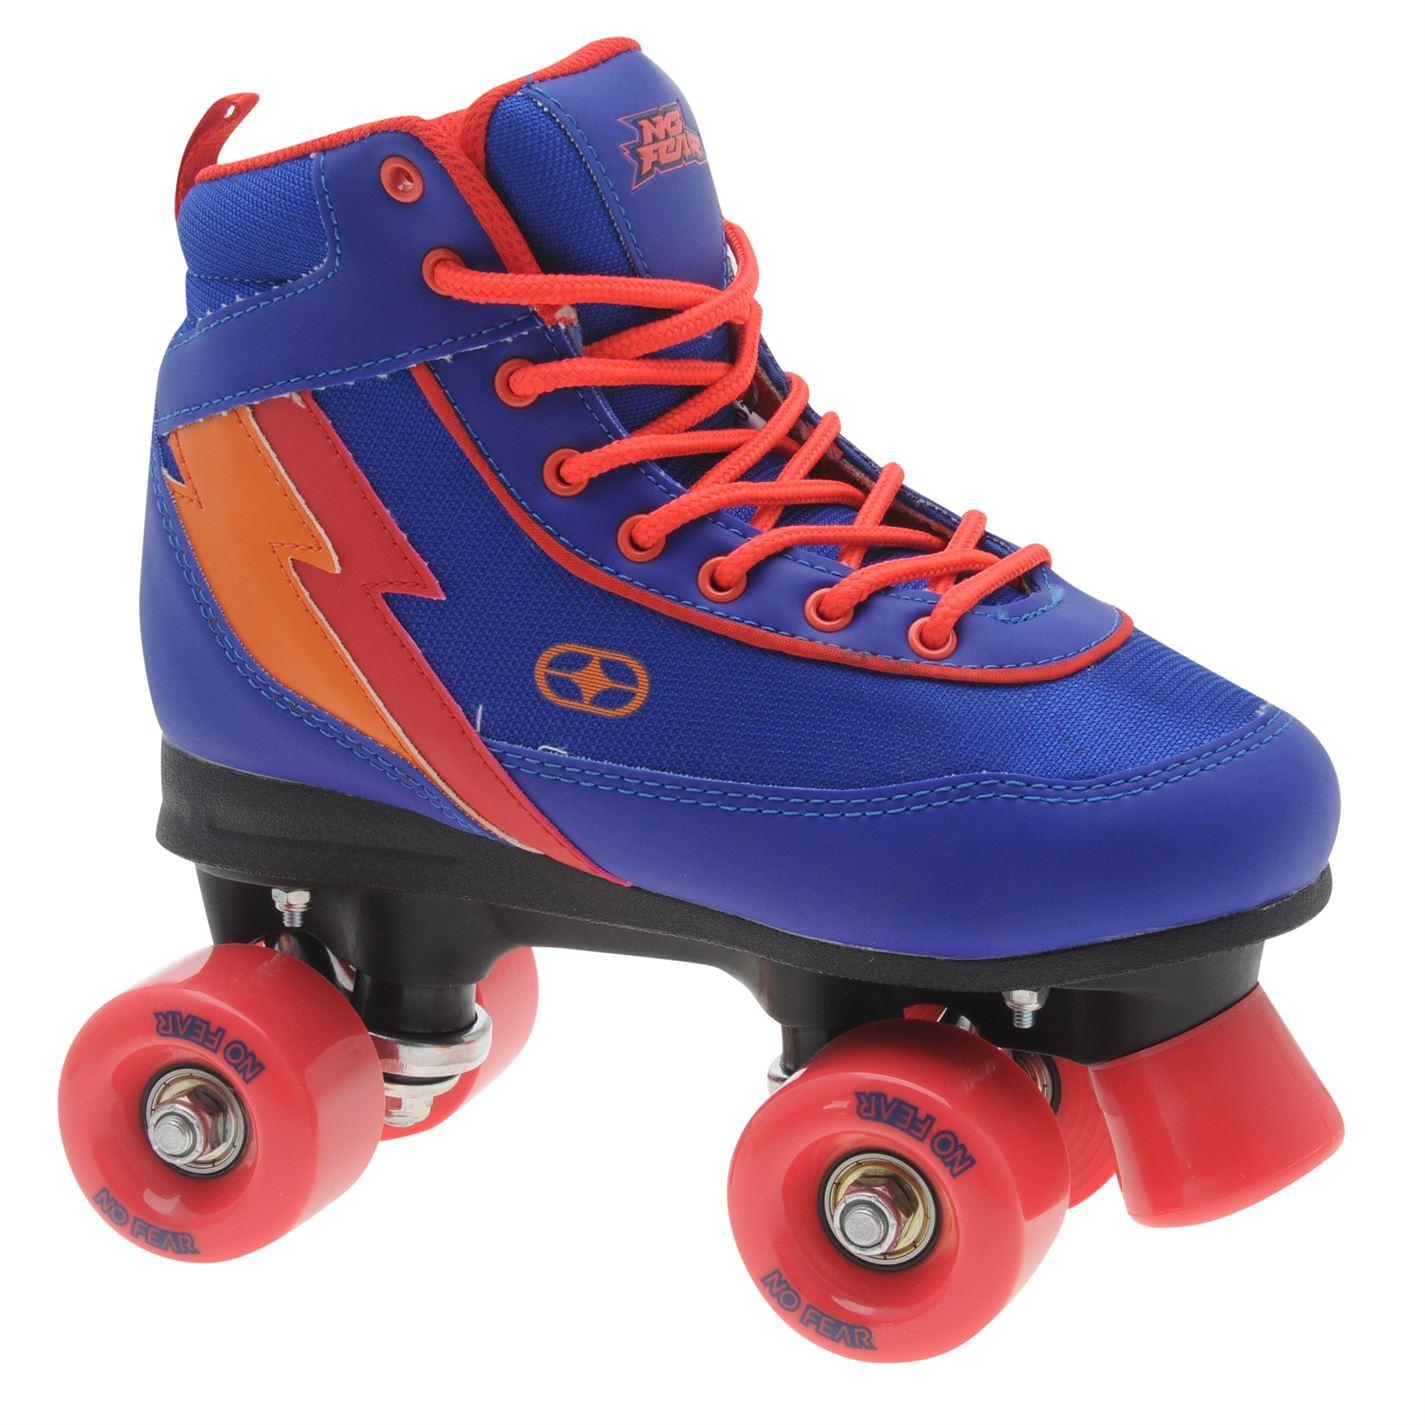 UK Kids Roller Skate Shoes Review